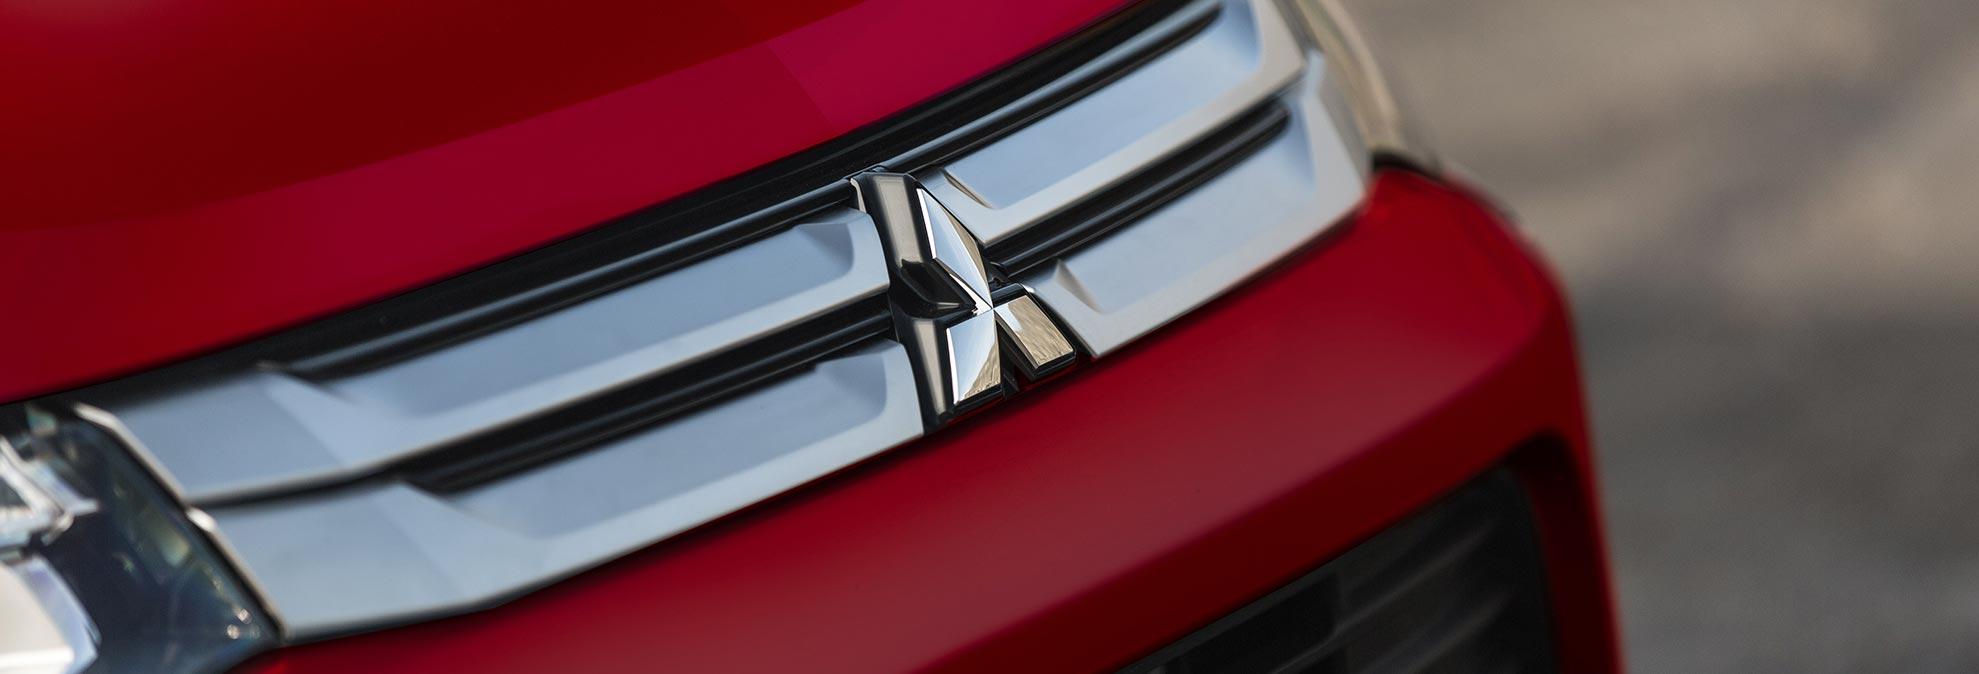 Mitsubishi Fuel Economy Cheating Dates To 1991 Consumer